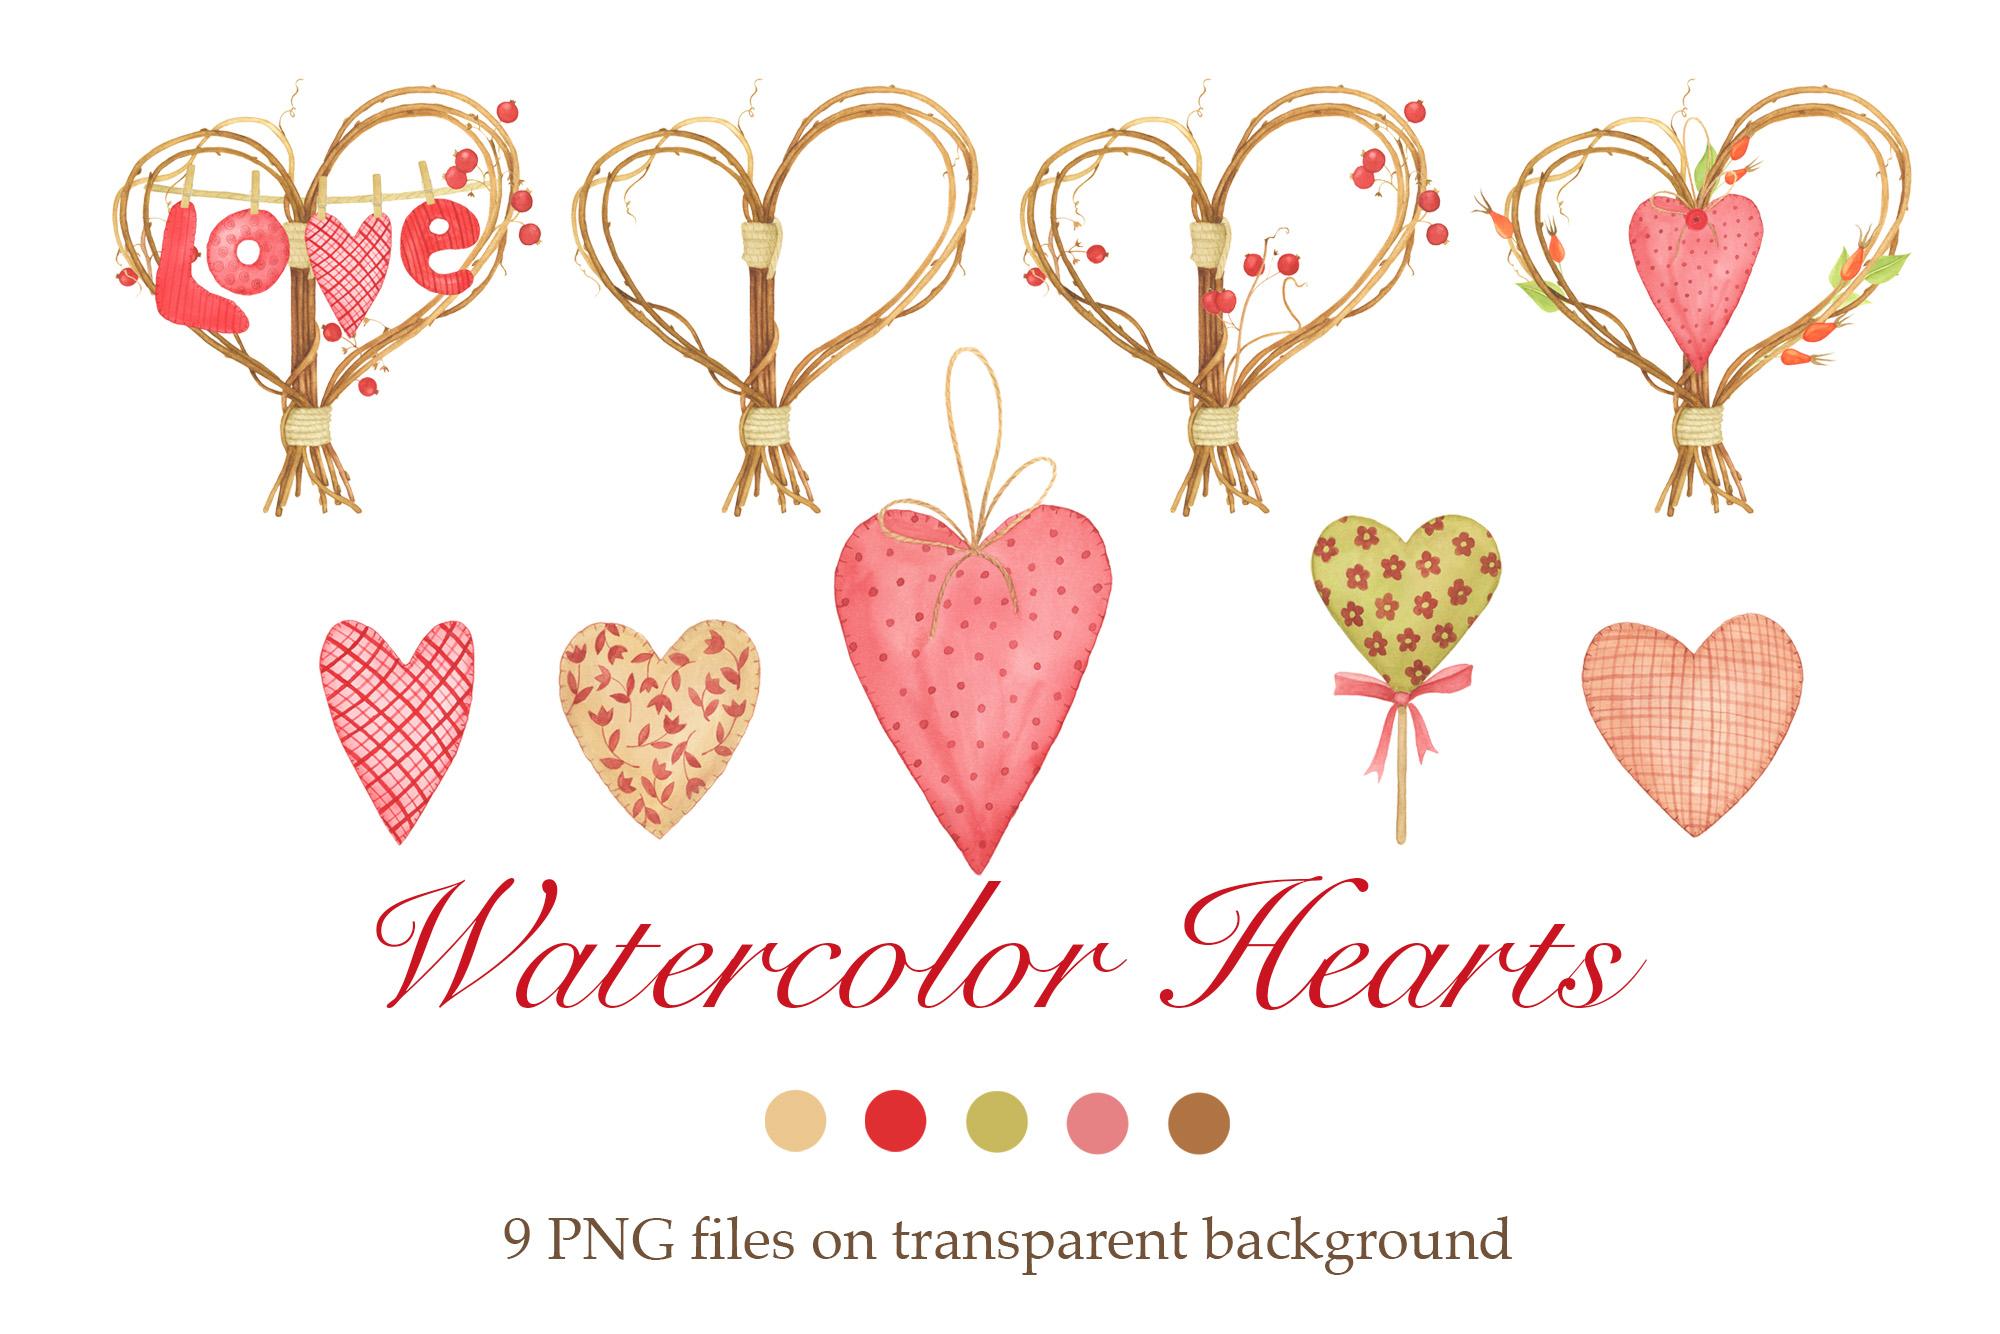 Watercolor Hearts Clipart.